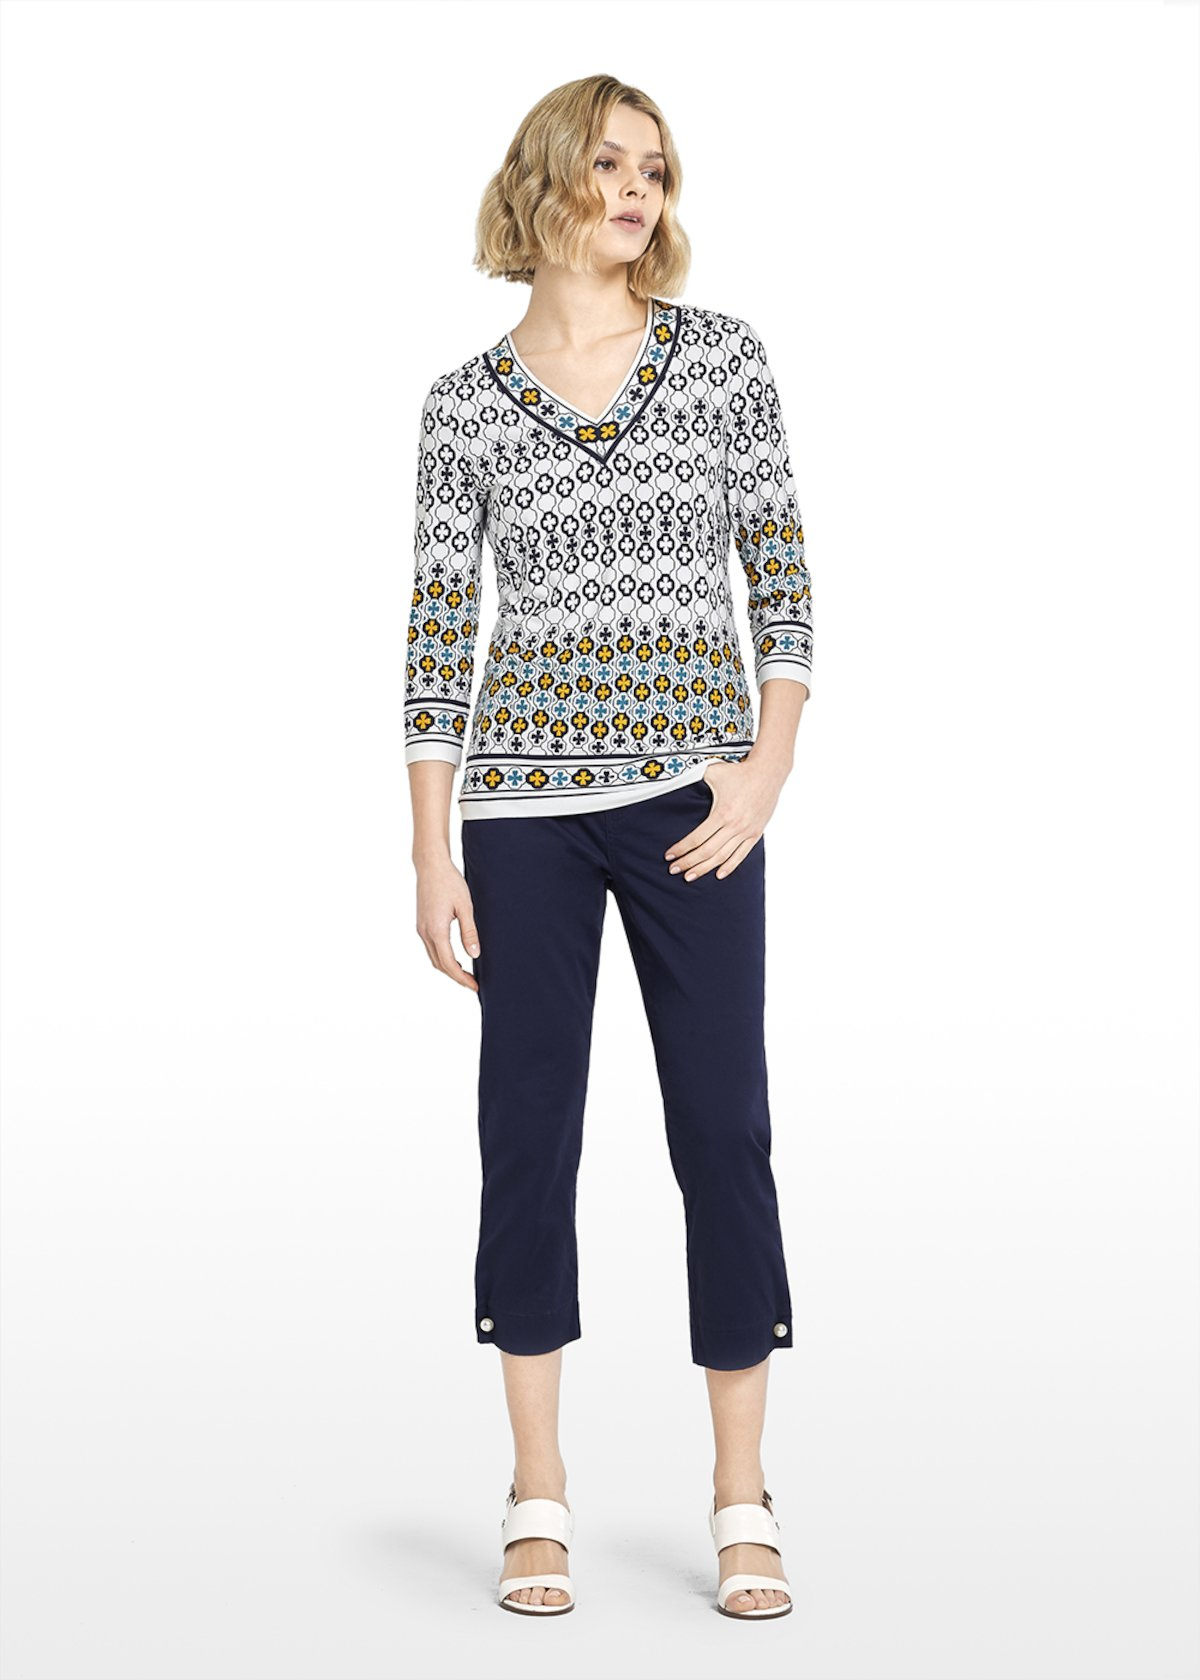 Mosaic pattern jersey Samel t-shirt - White / Blue Fantasia - Woman